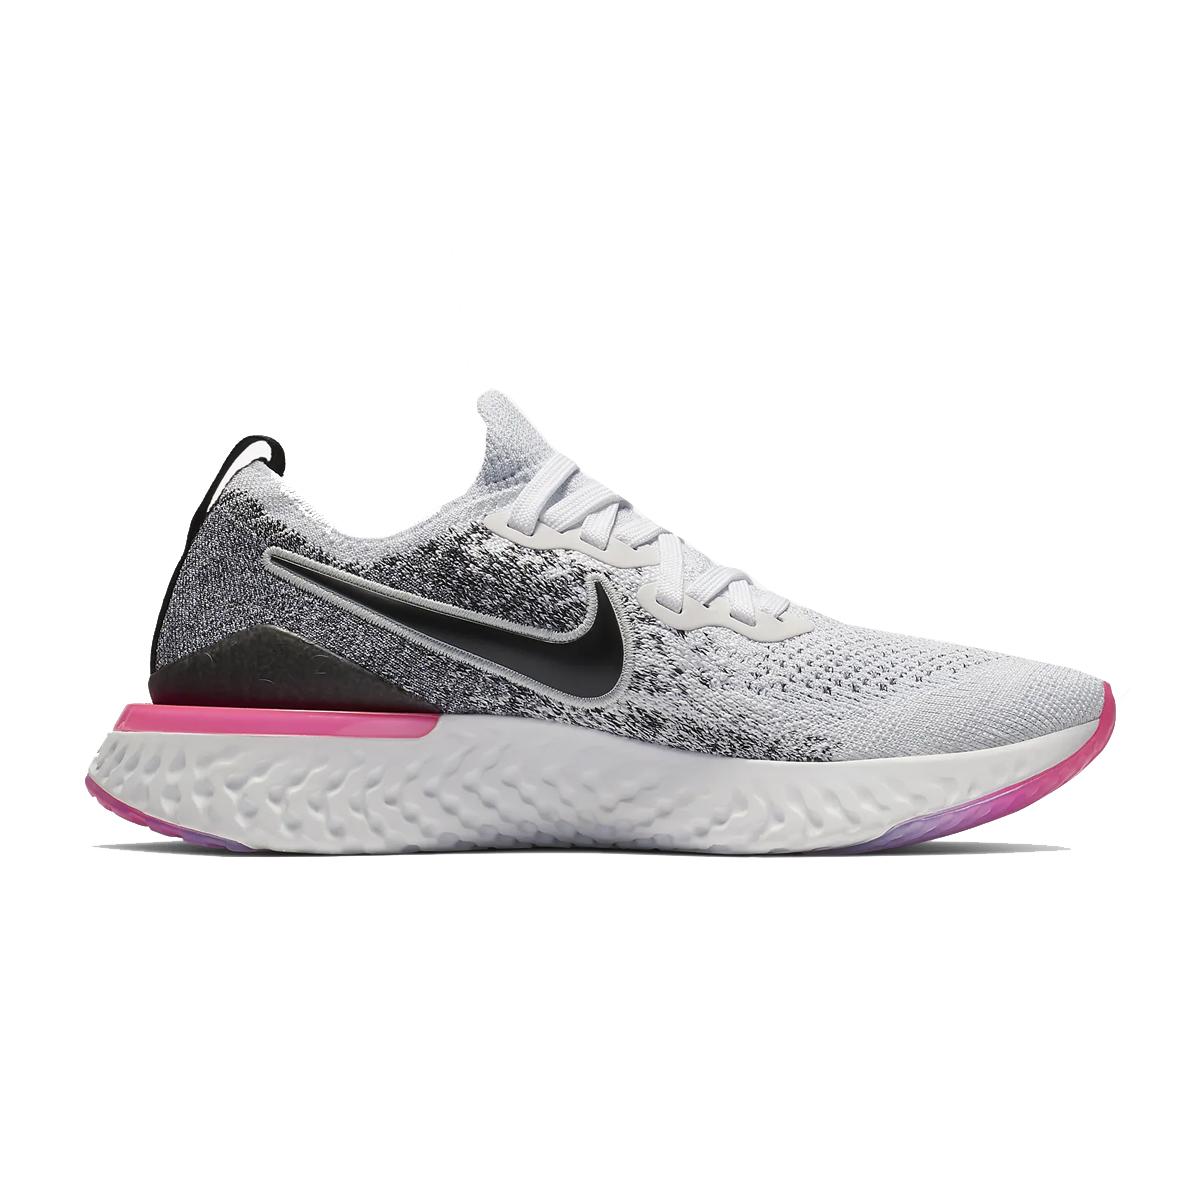 d2151d63789ae Nike Women's Epic React Flyknit 2 Running Shoe - White Black ...